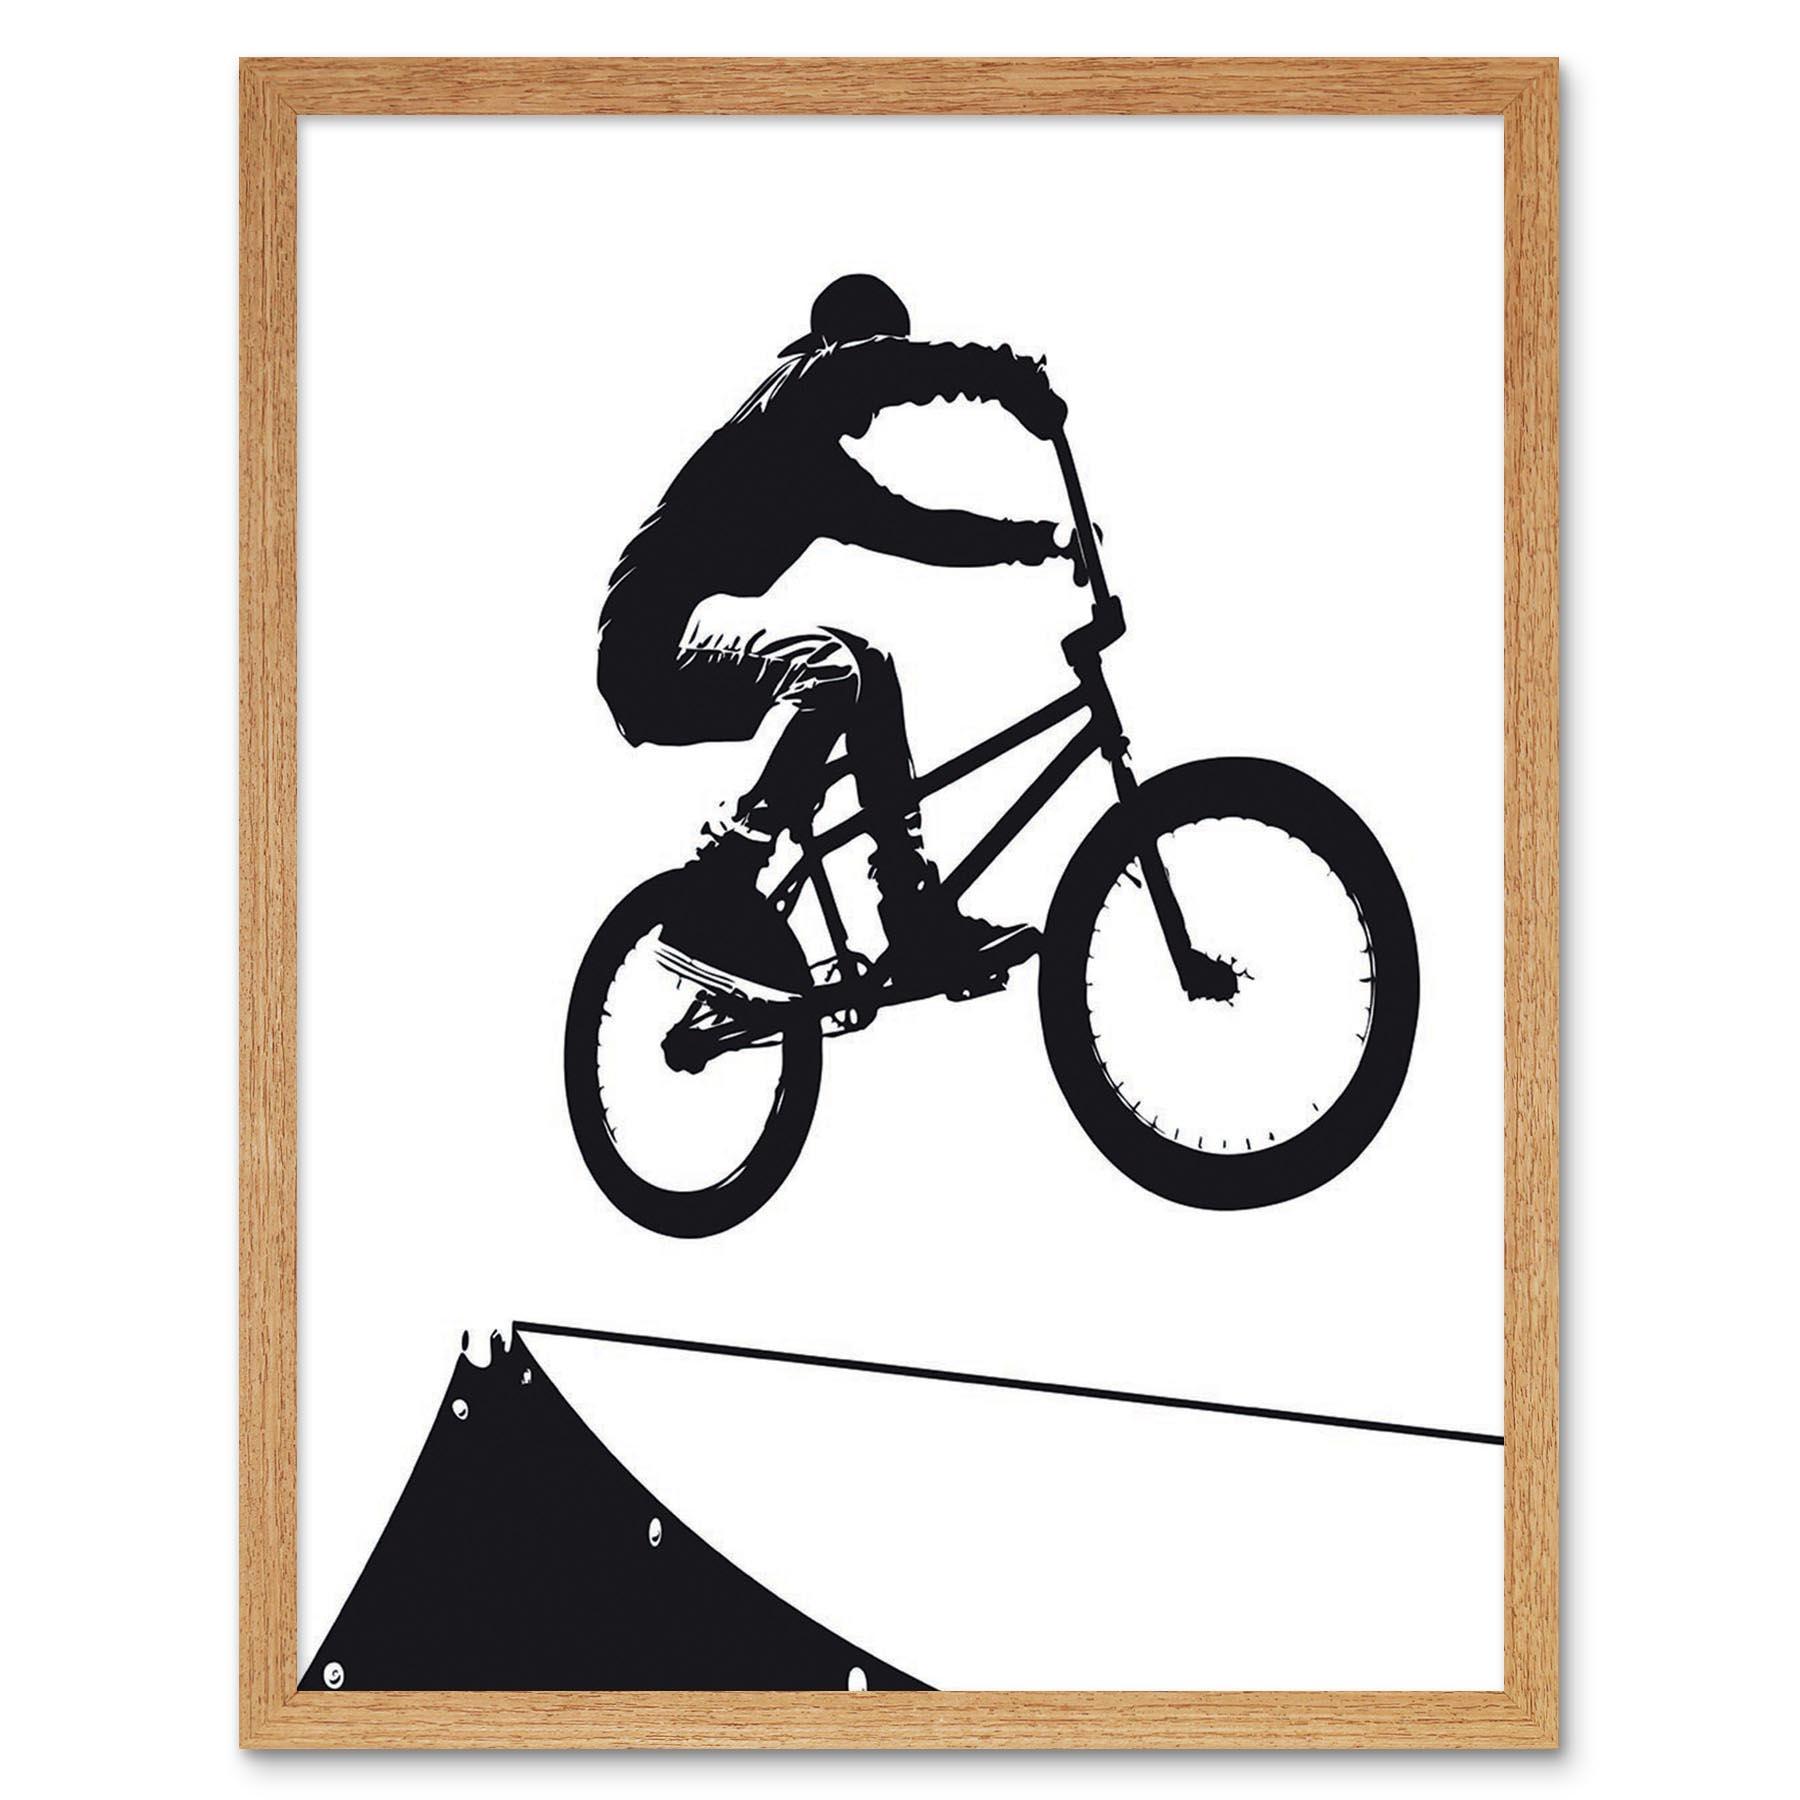 Indexbild 12 - Painting Sport Bmx Bike Bicycle Jump Air Ramp Black White 12X16 Framed Art Print